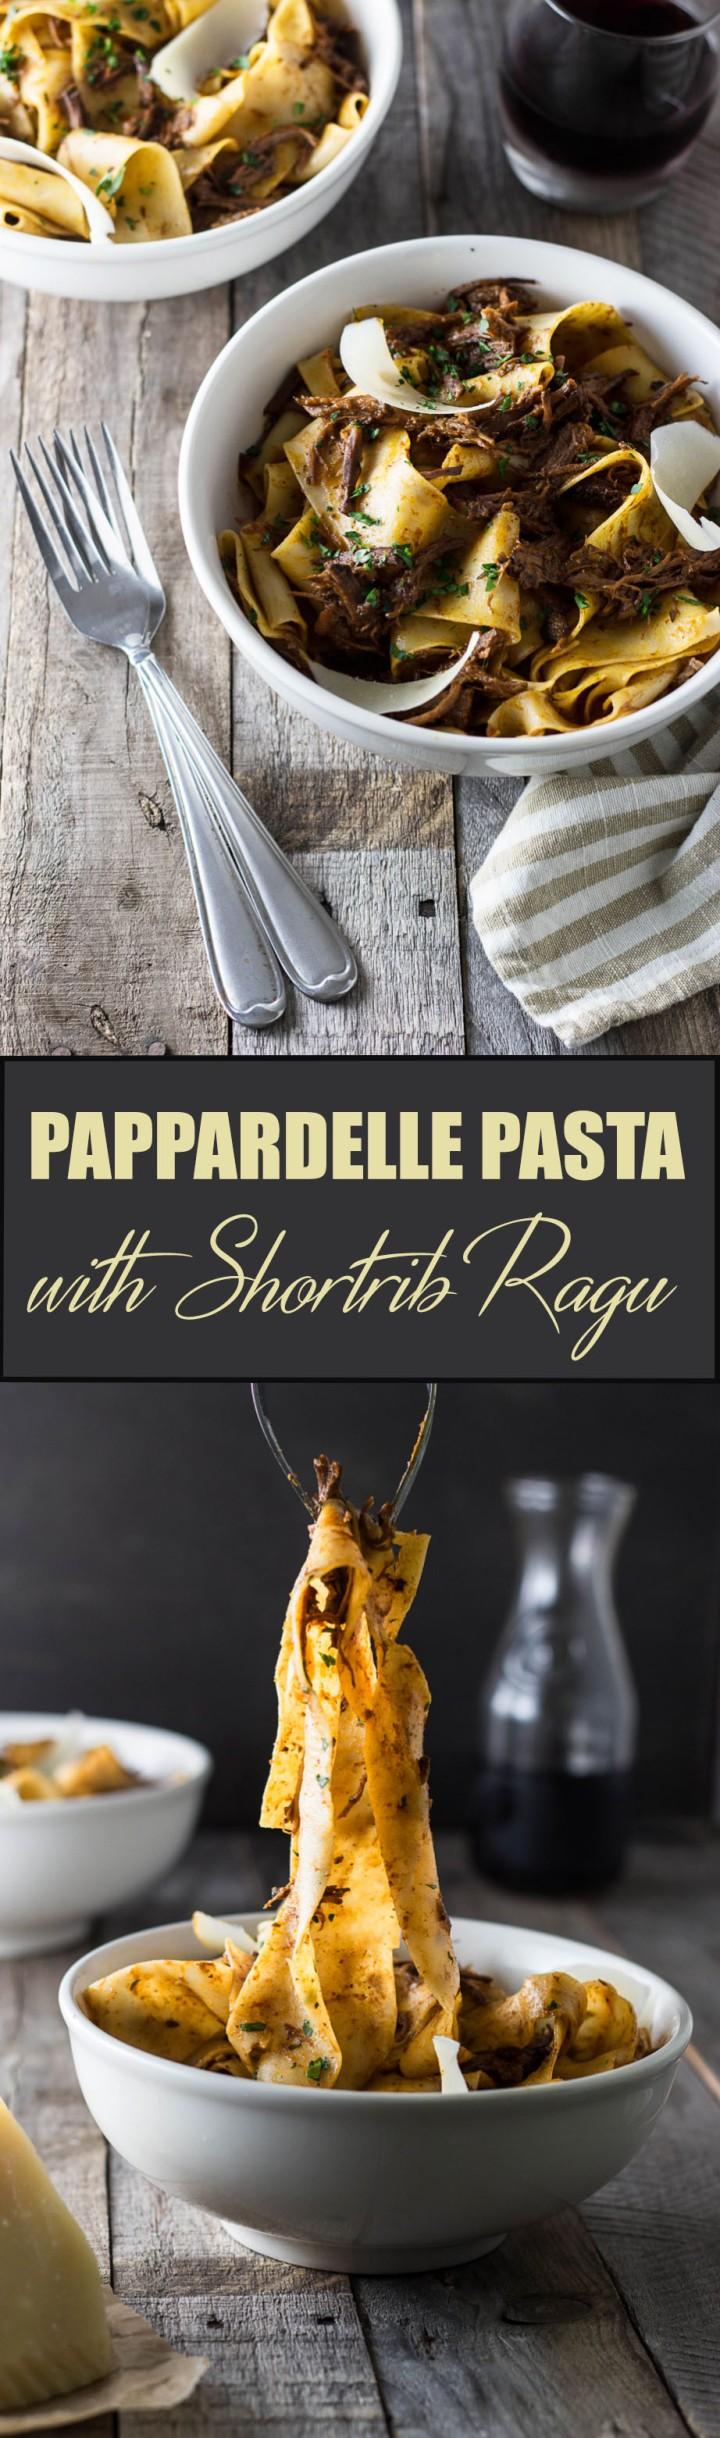 Pappardelle with Short Rib Ragu | cookingatsabrinas.com @sabrinascooking